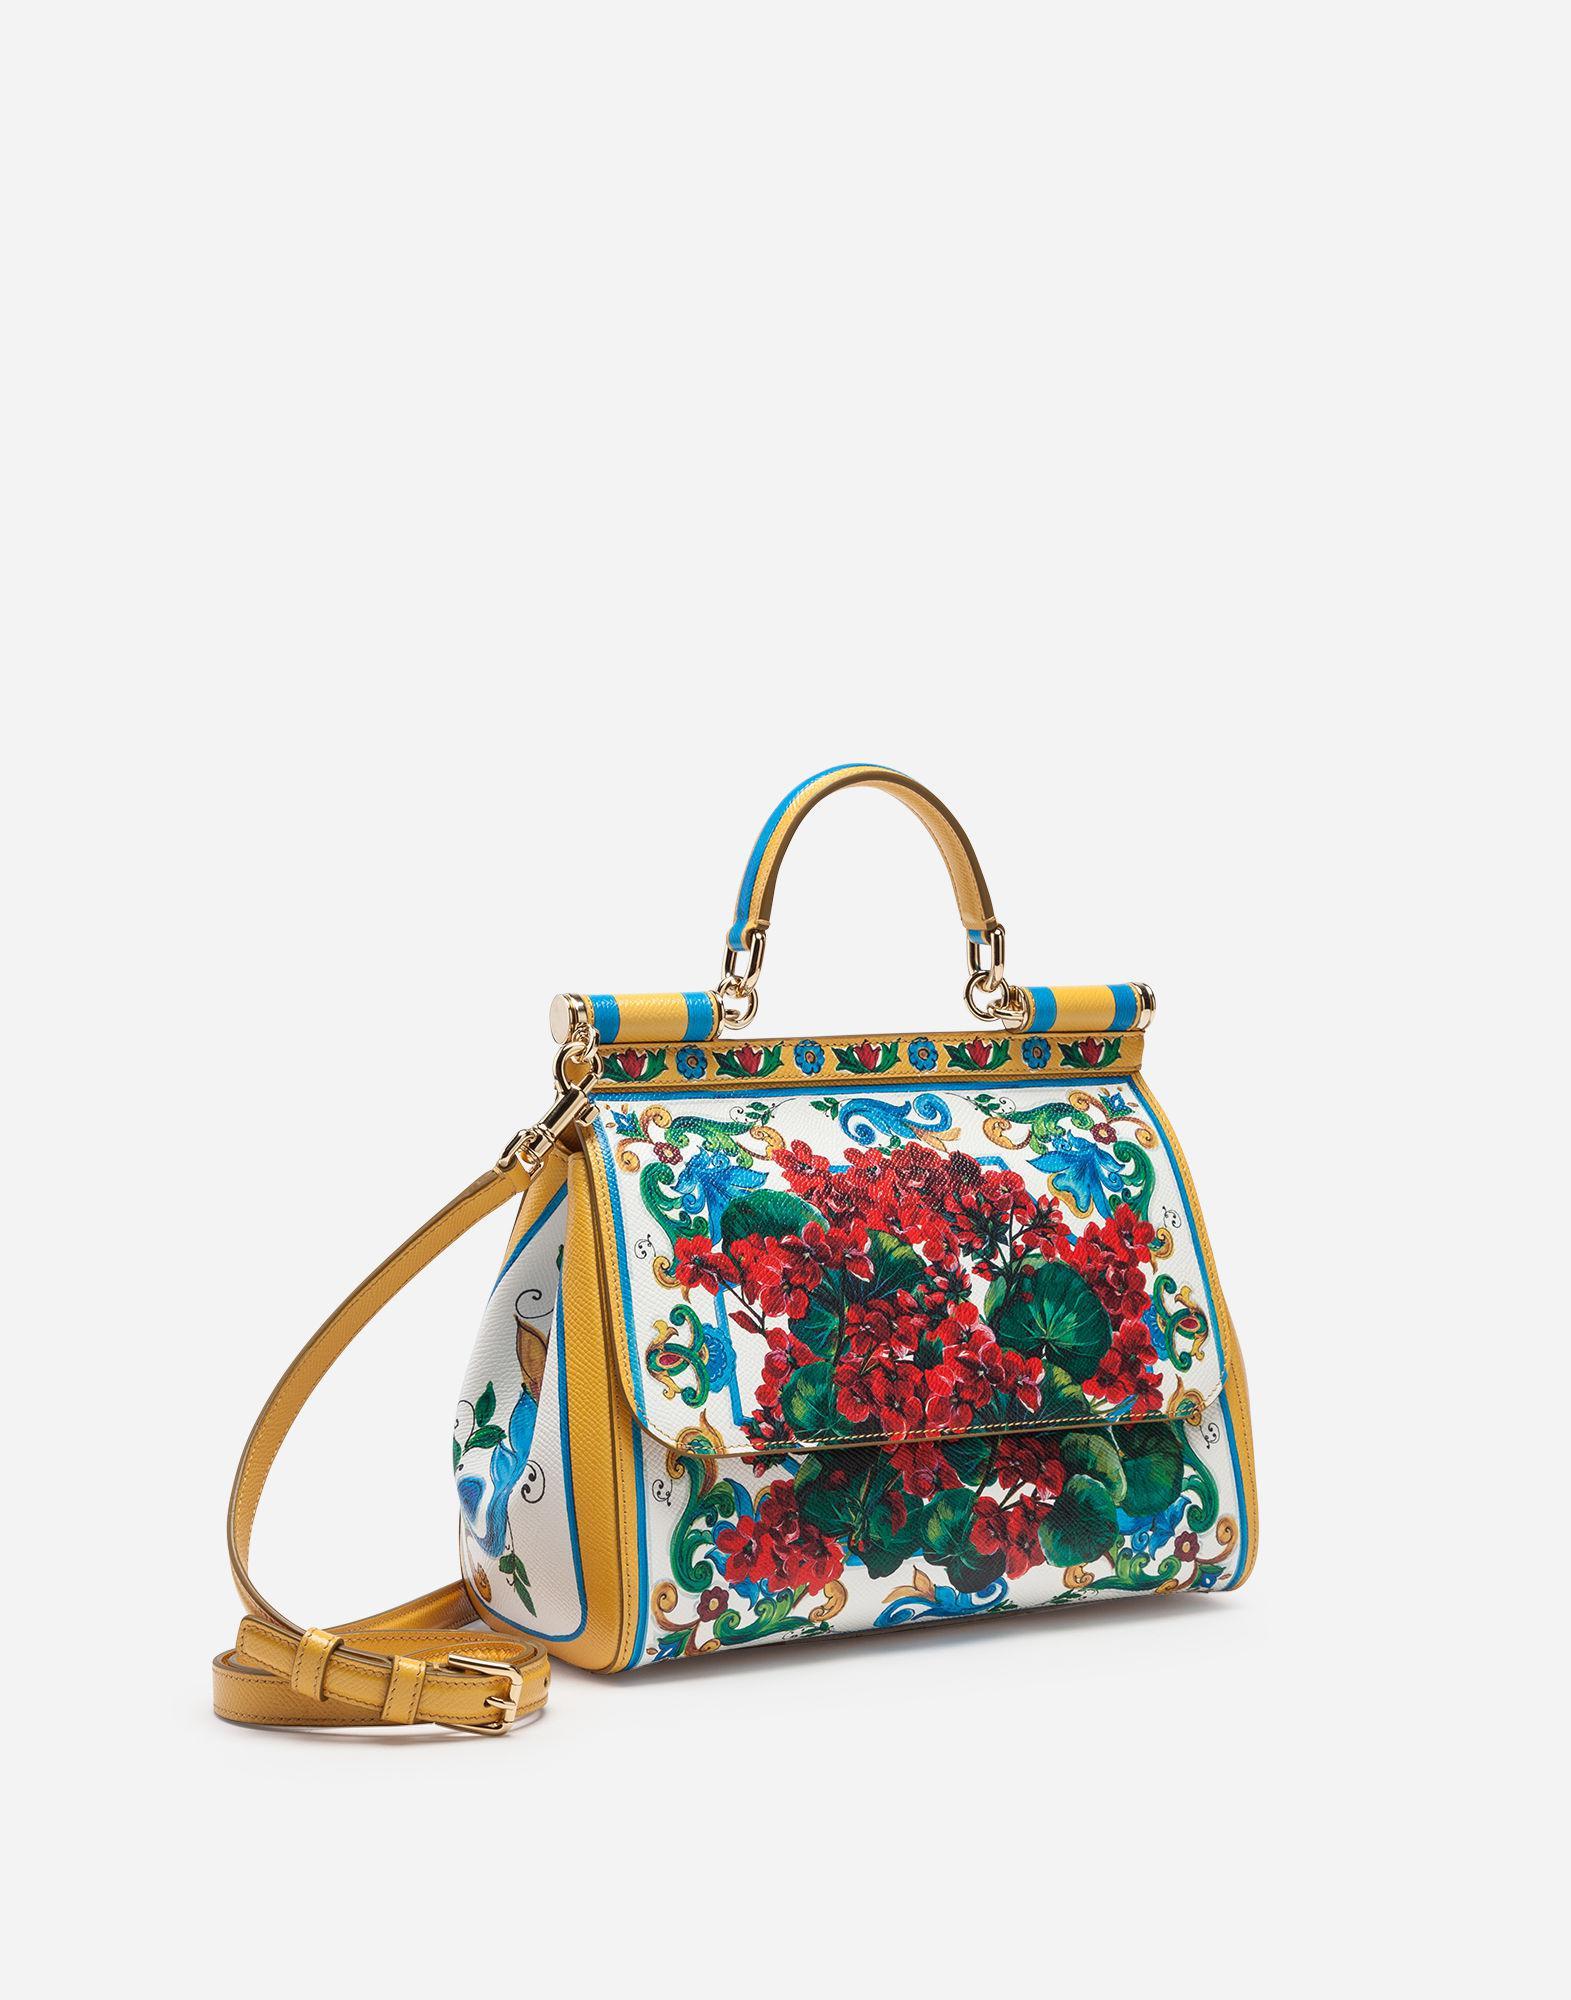 10f1b15e29cf Lyst - Dolce   Gabbana Medium Sicily Bag In Printed Dauphine Calfskin